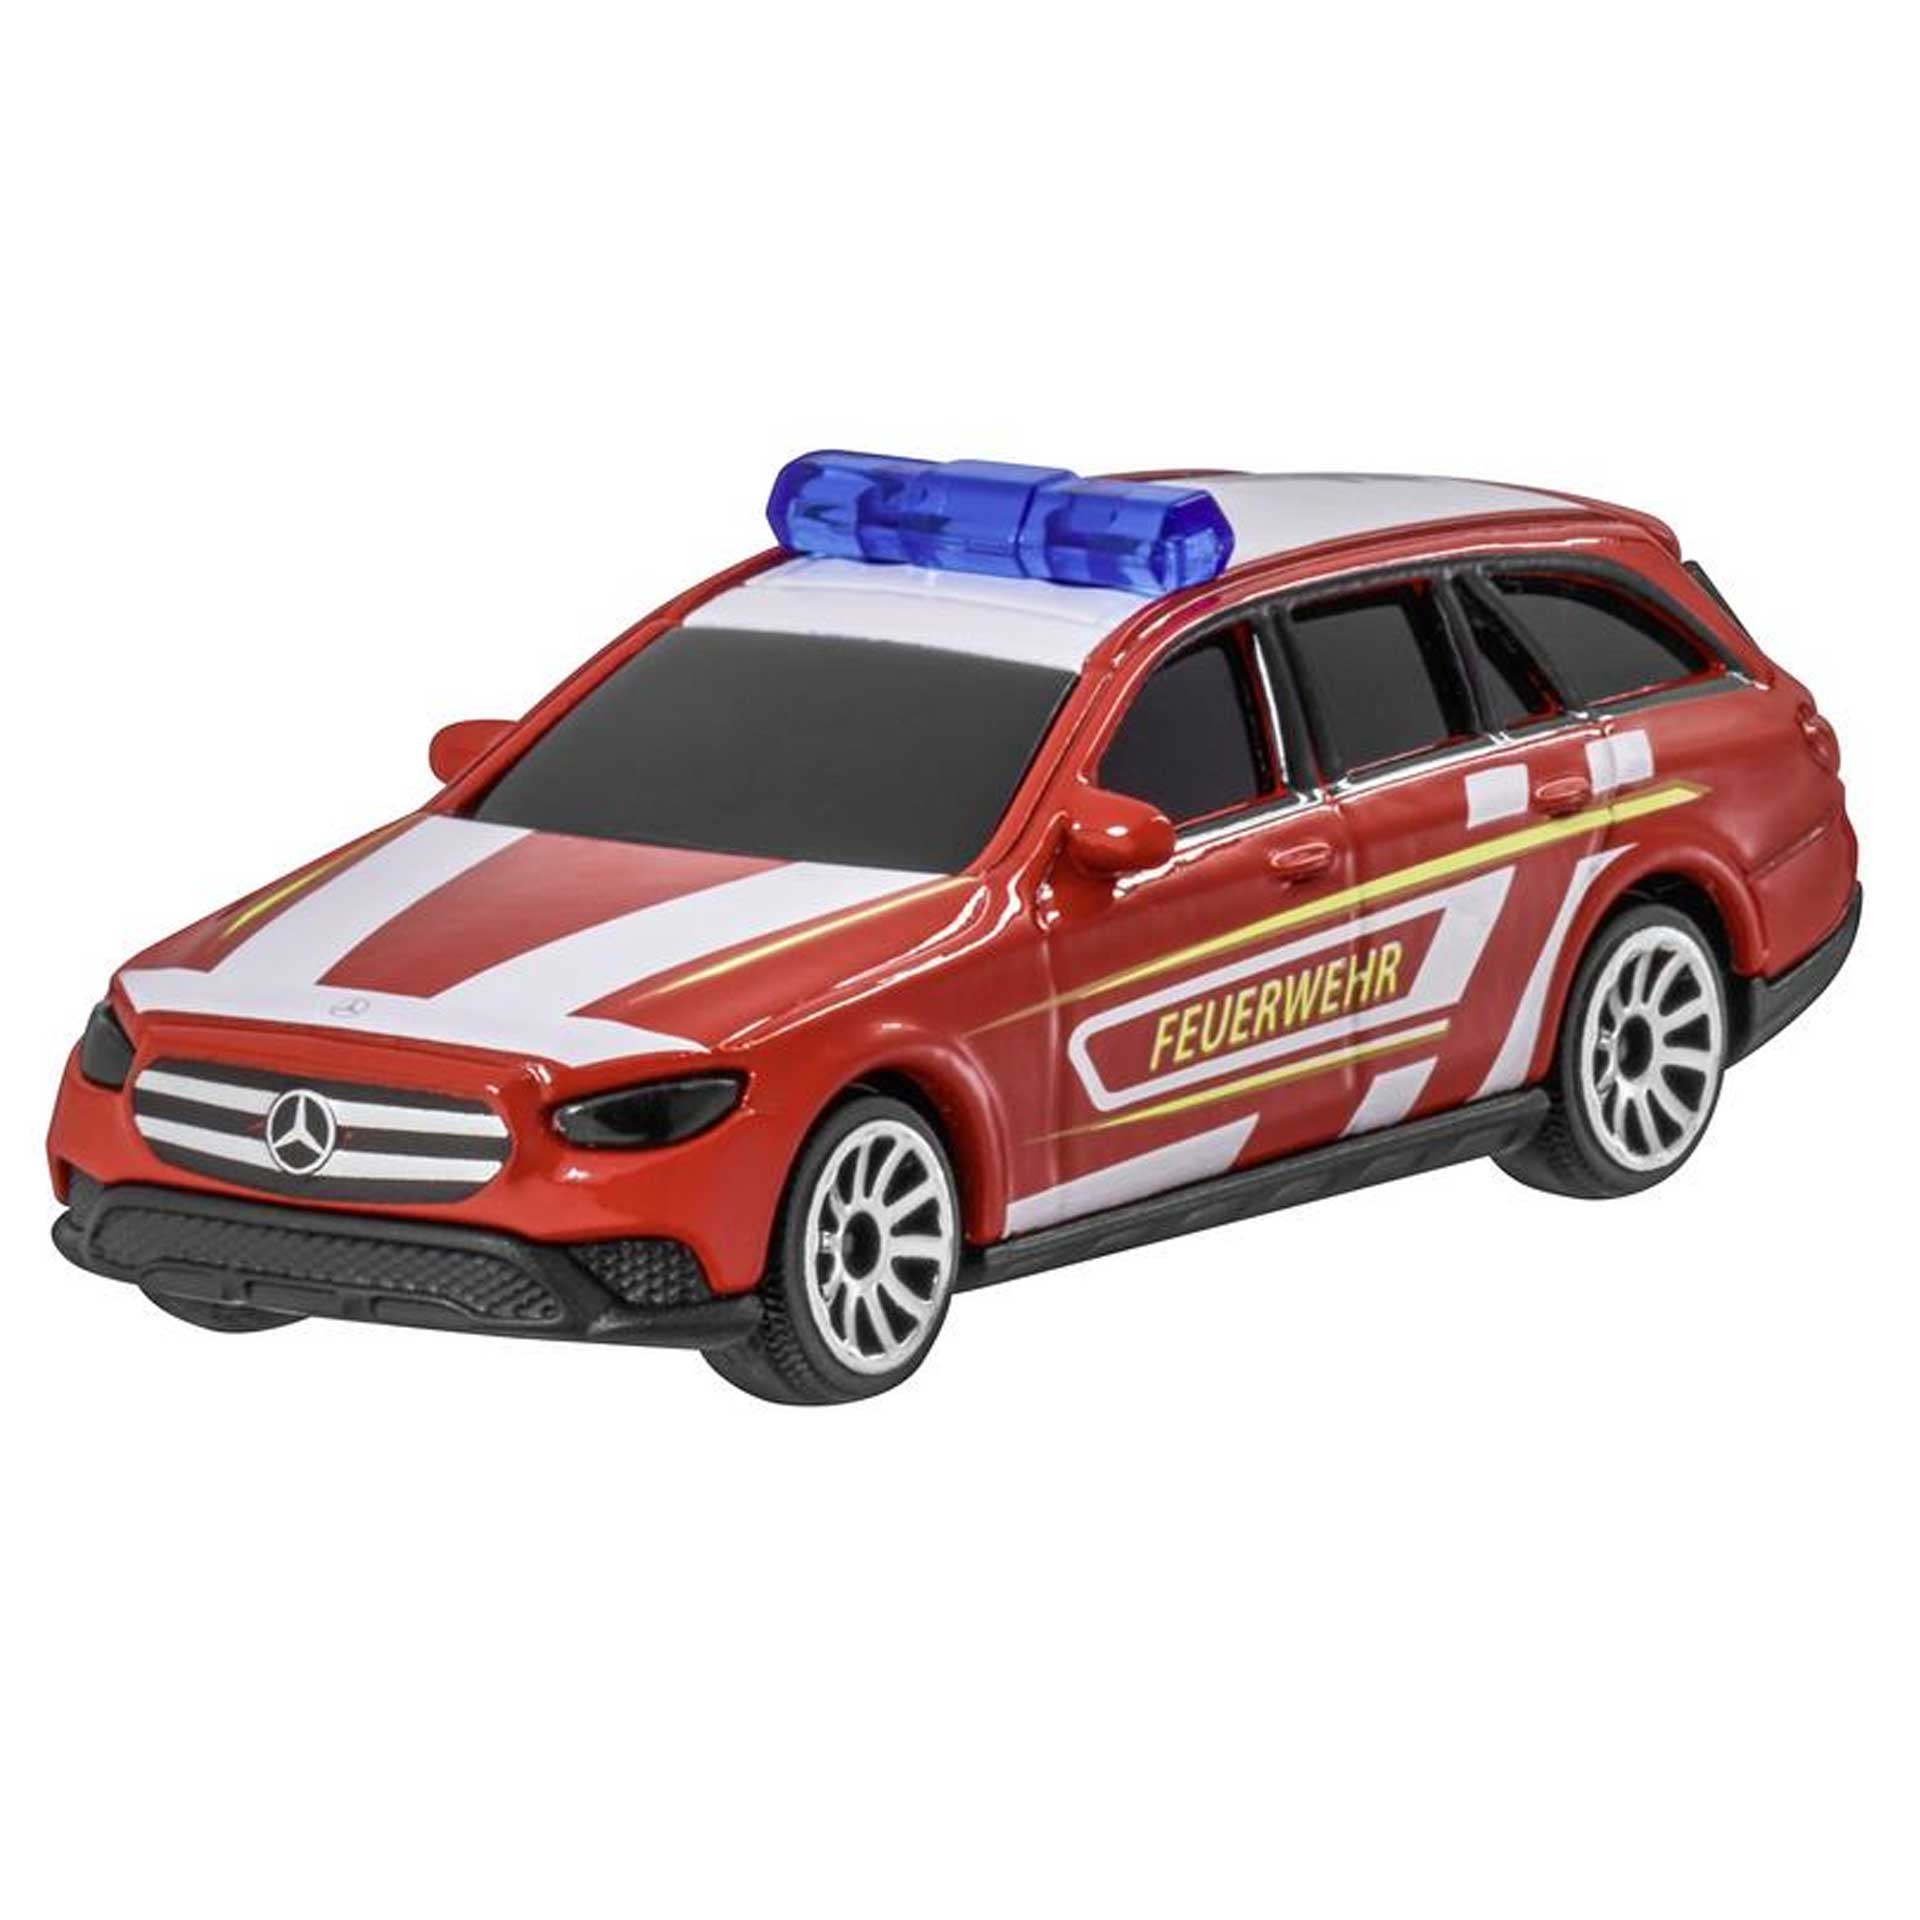 Mercedes-Benz Modellauto E-Klasse Feuerwehr S213 T-Modell All-Terrain 1:64